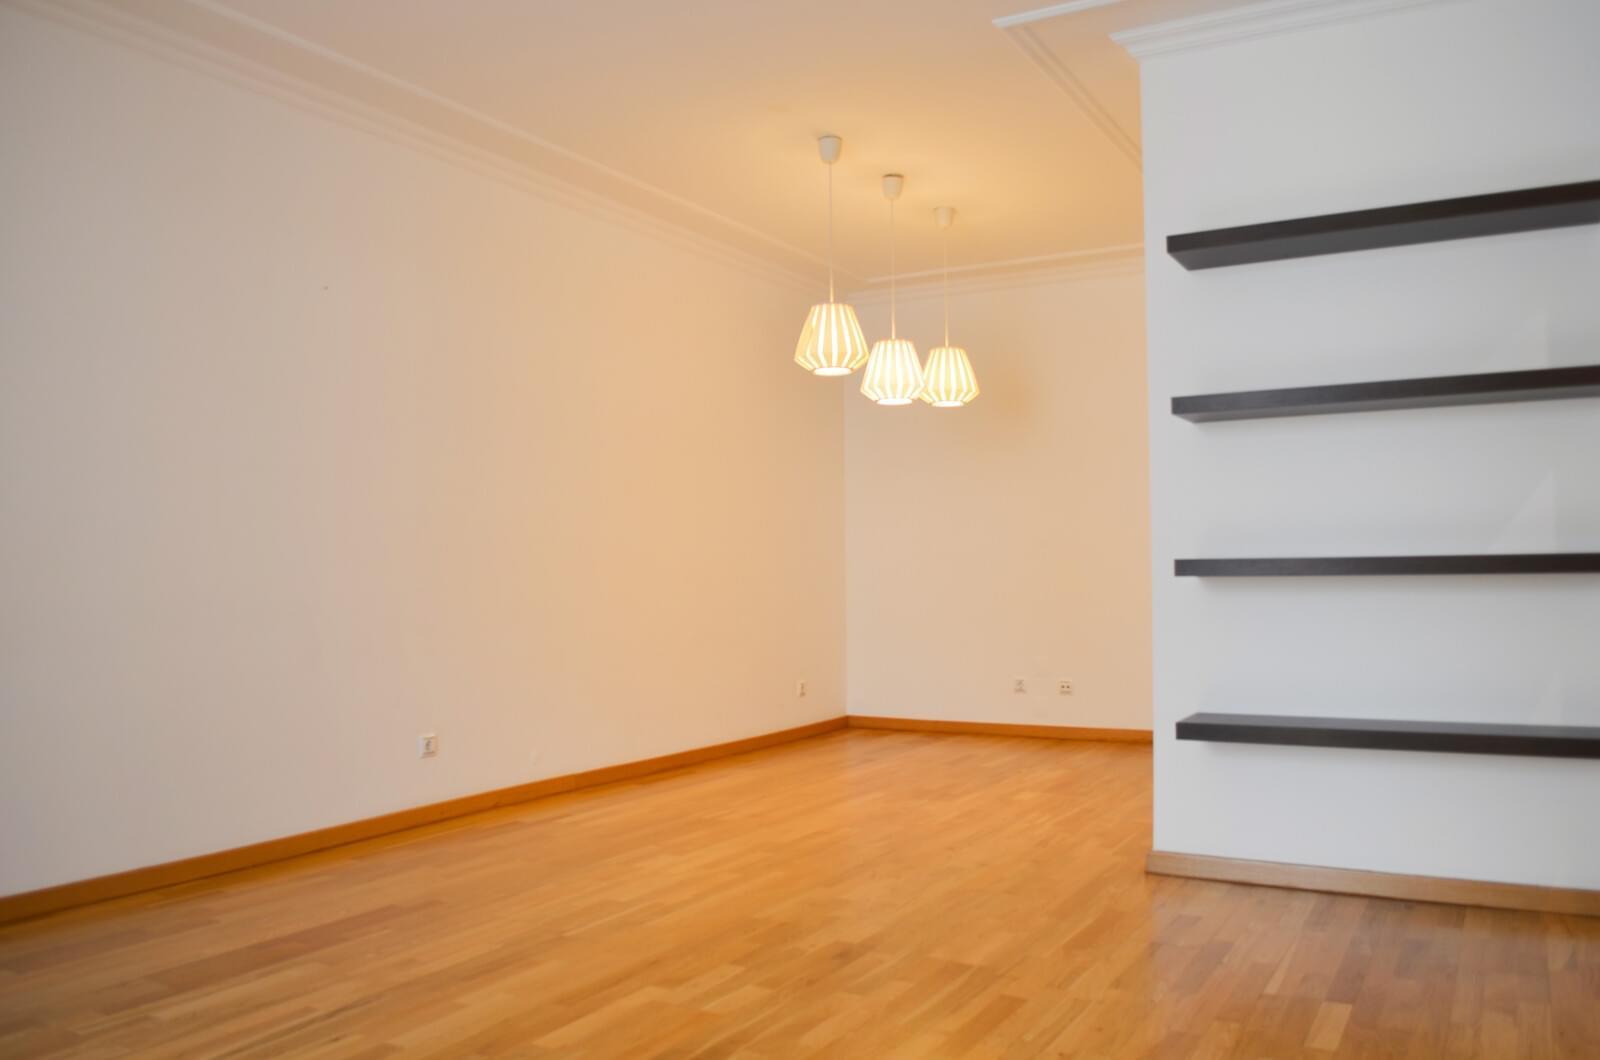 pf18839-apartamento-t2-lisboa-90337364-6b77-4e78-926b-8bfe13d66912